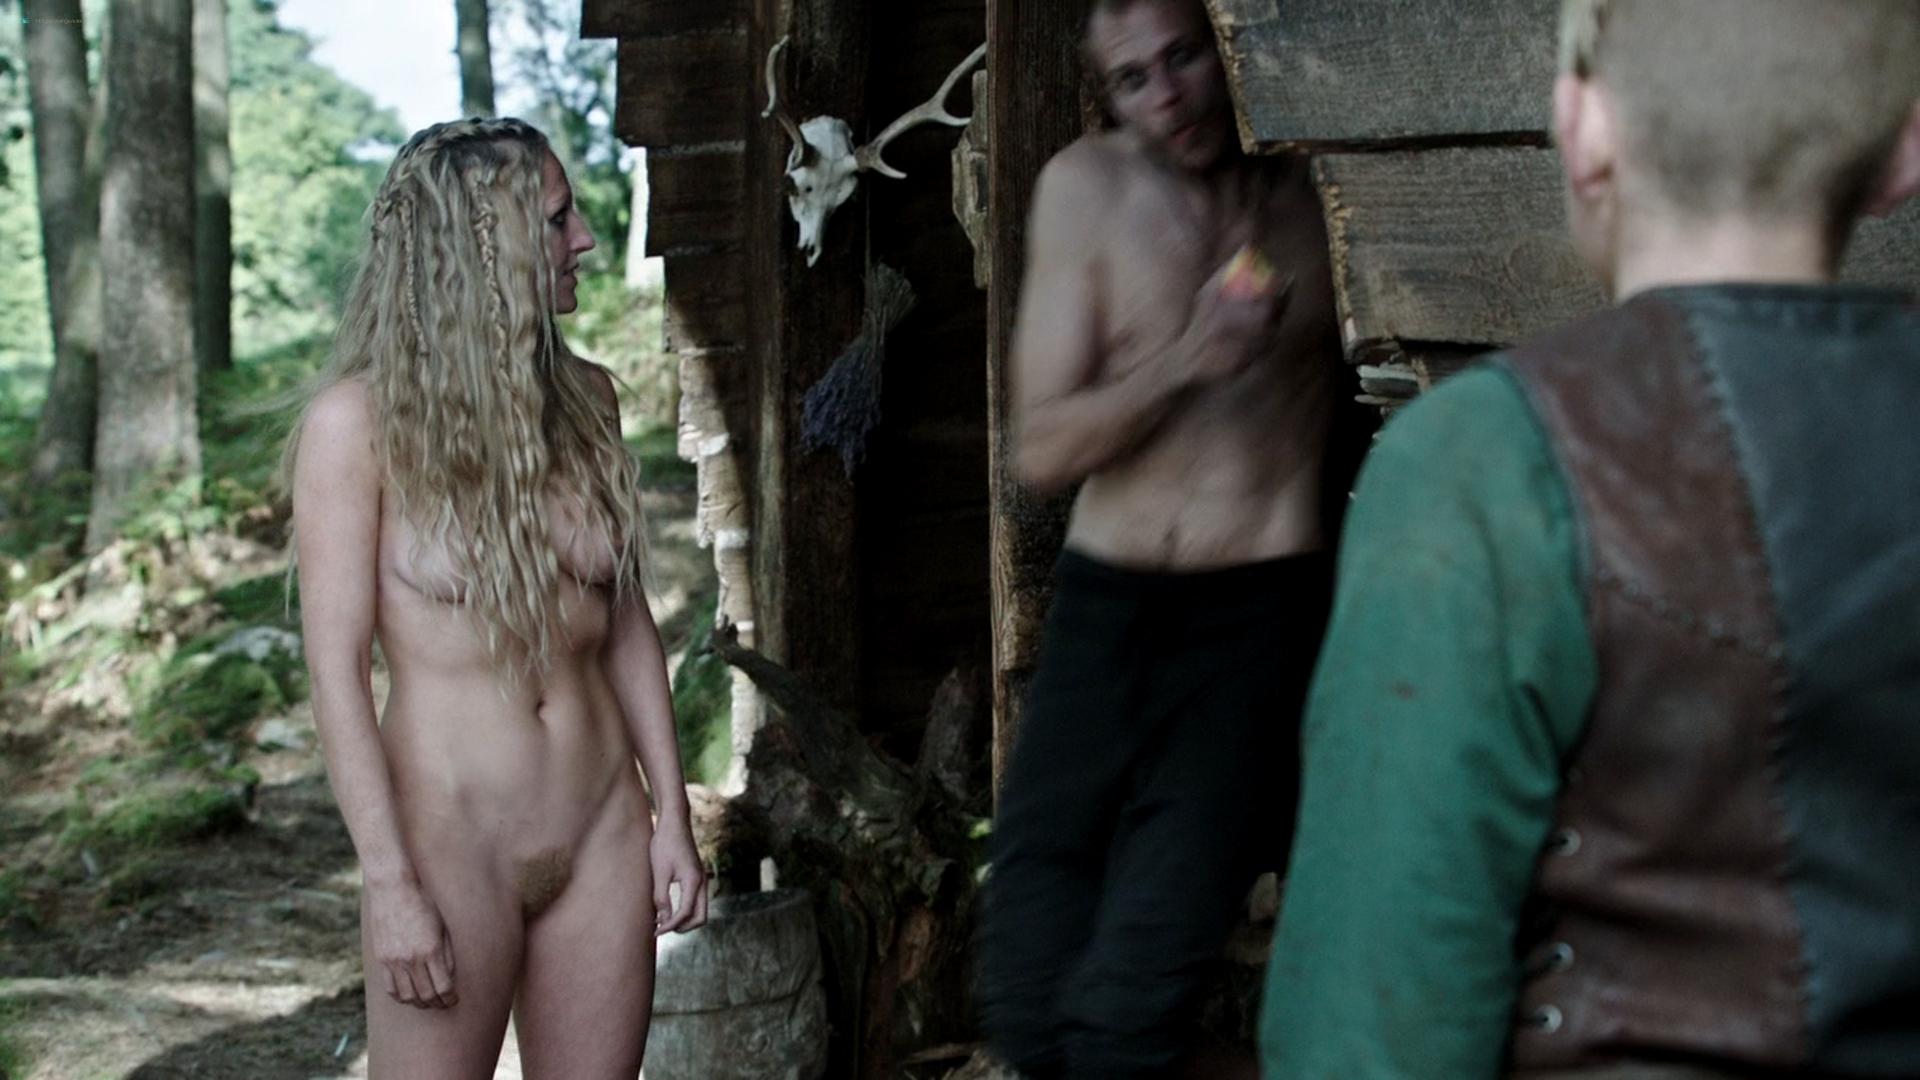 Maude Hirst Vikings 2013 s1e5 HD 1080p 1 1 3